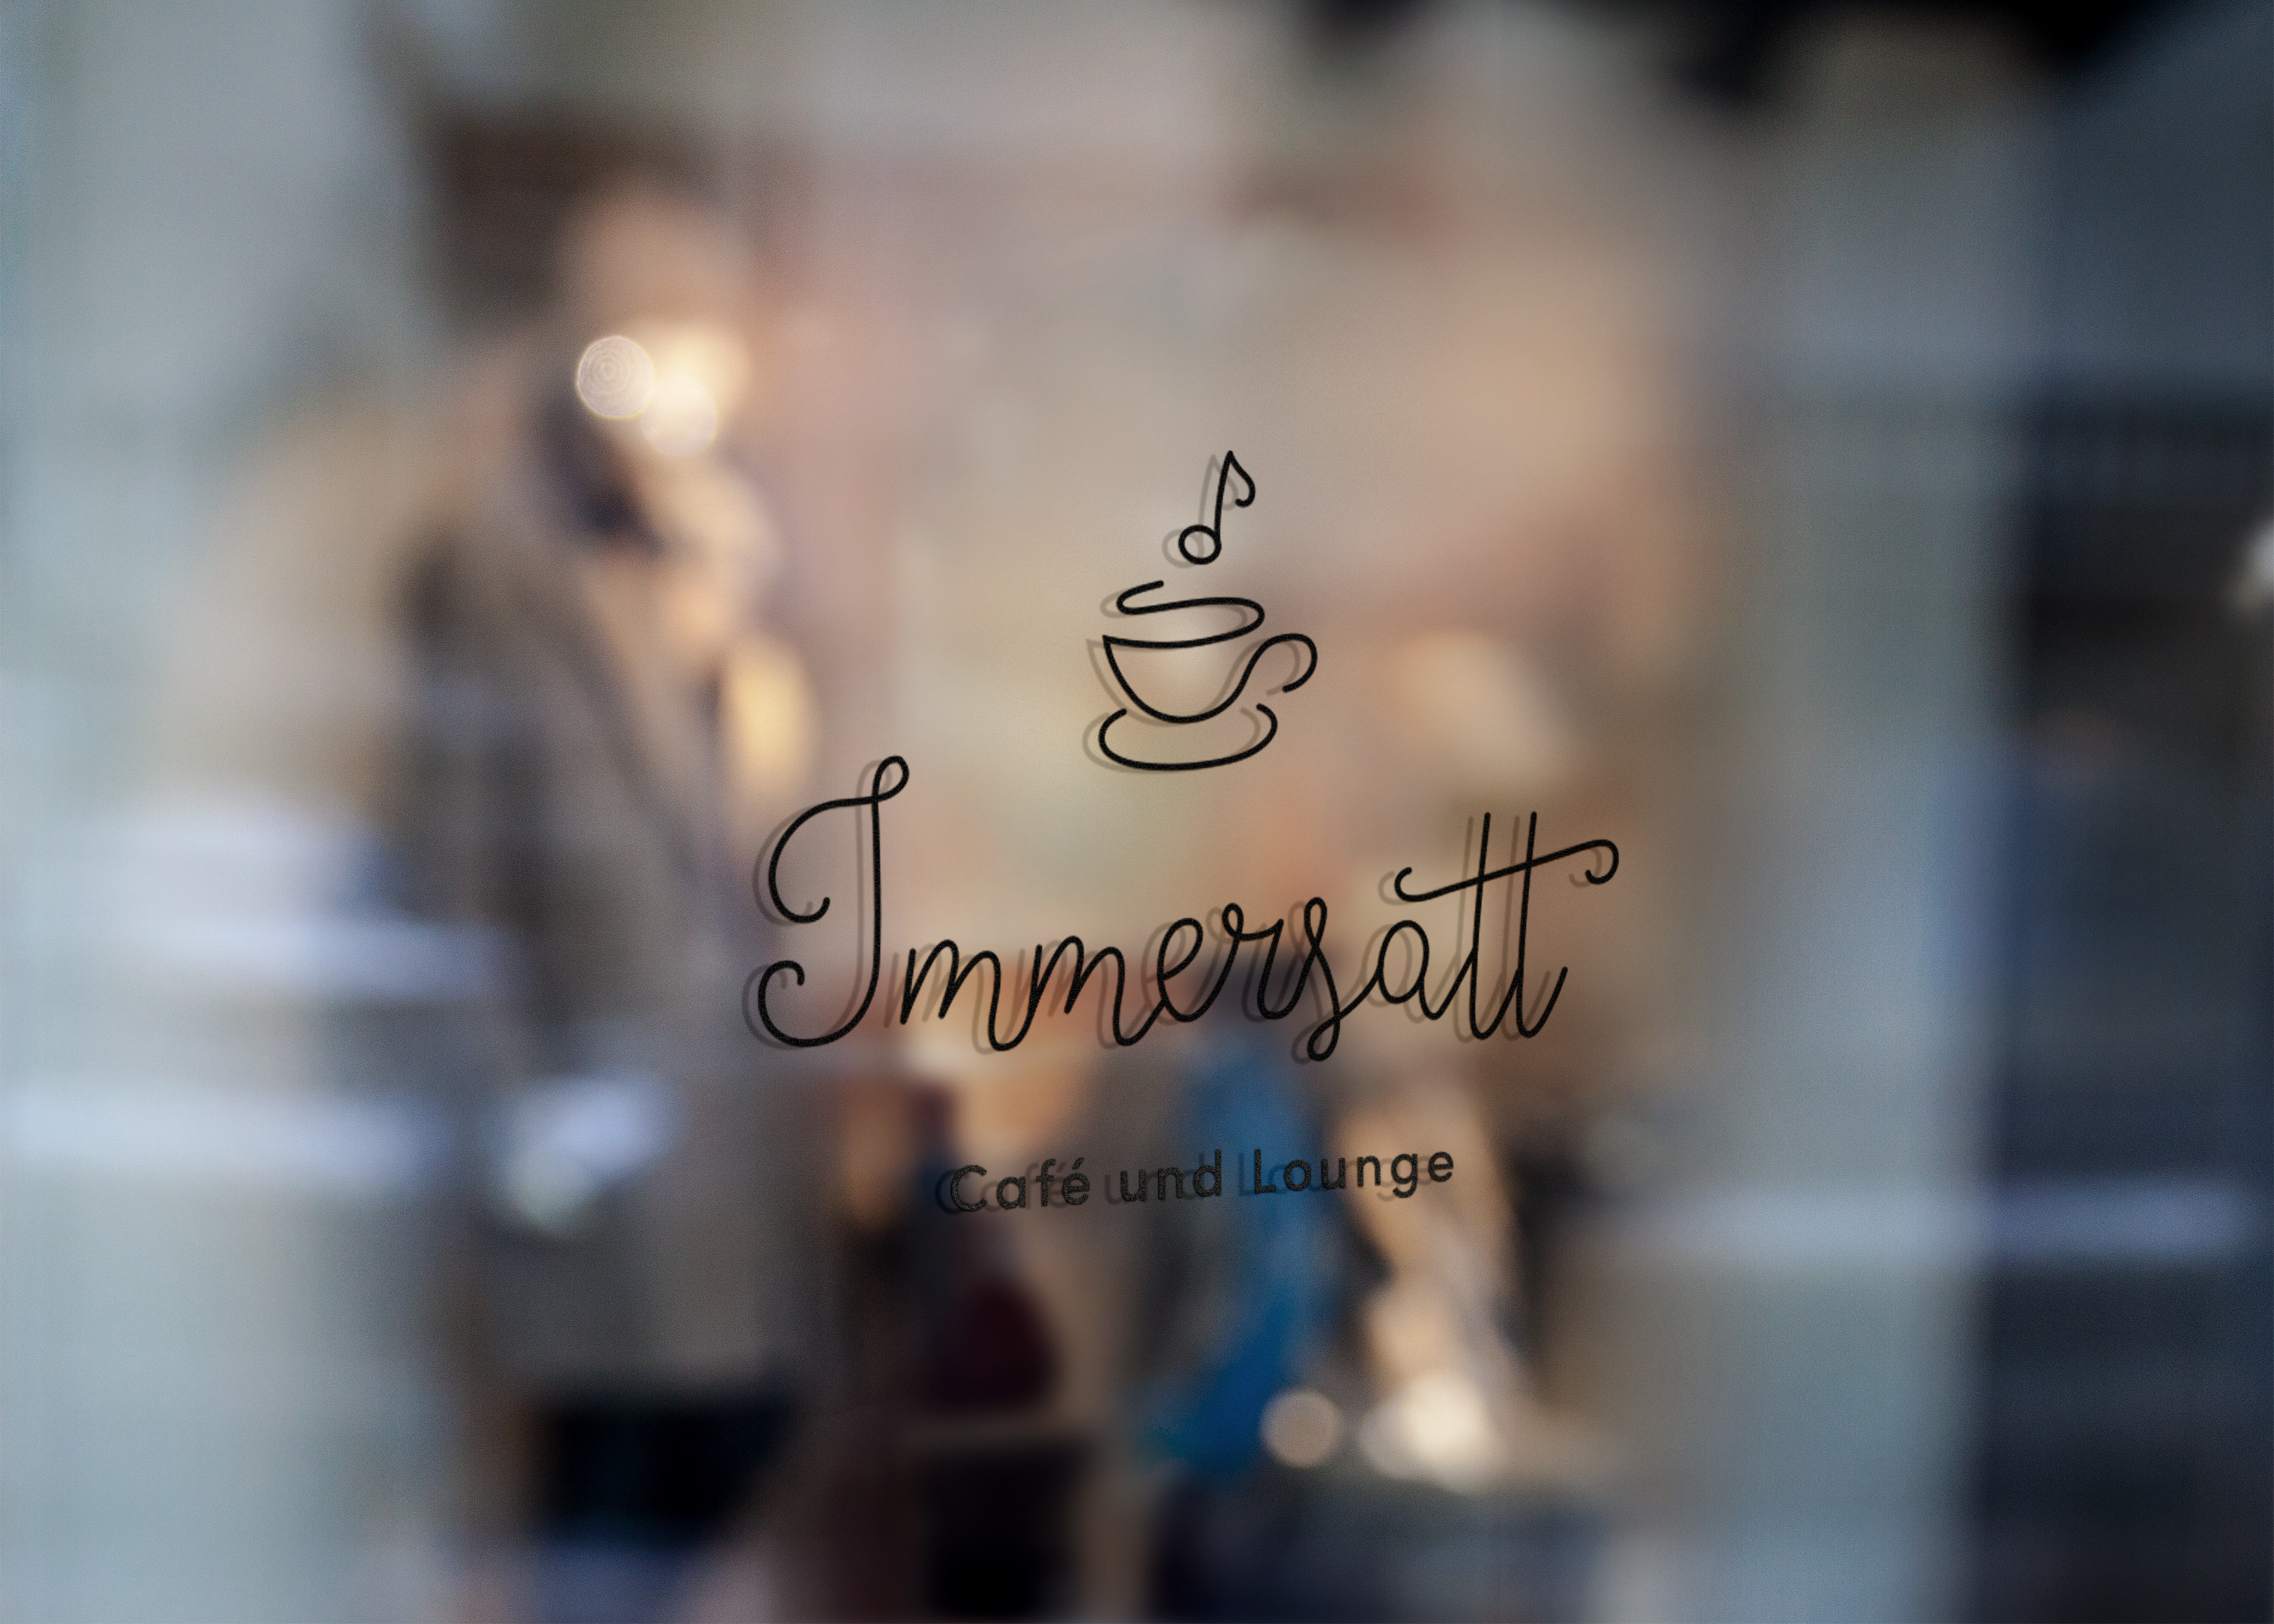 immersatt_window_01